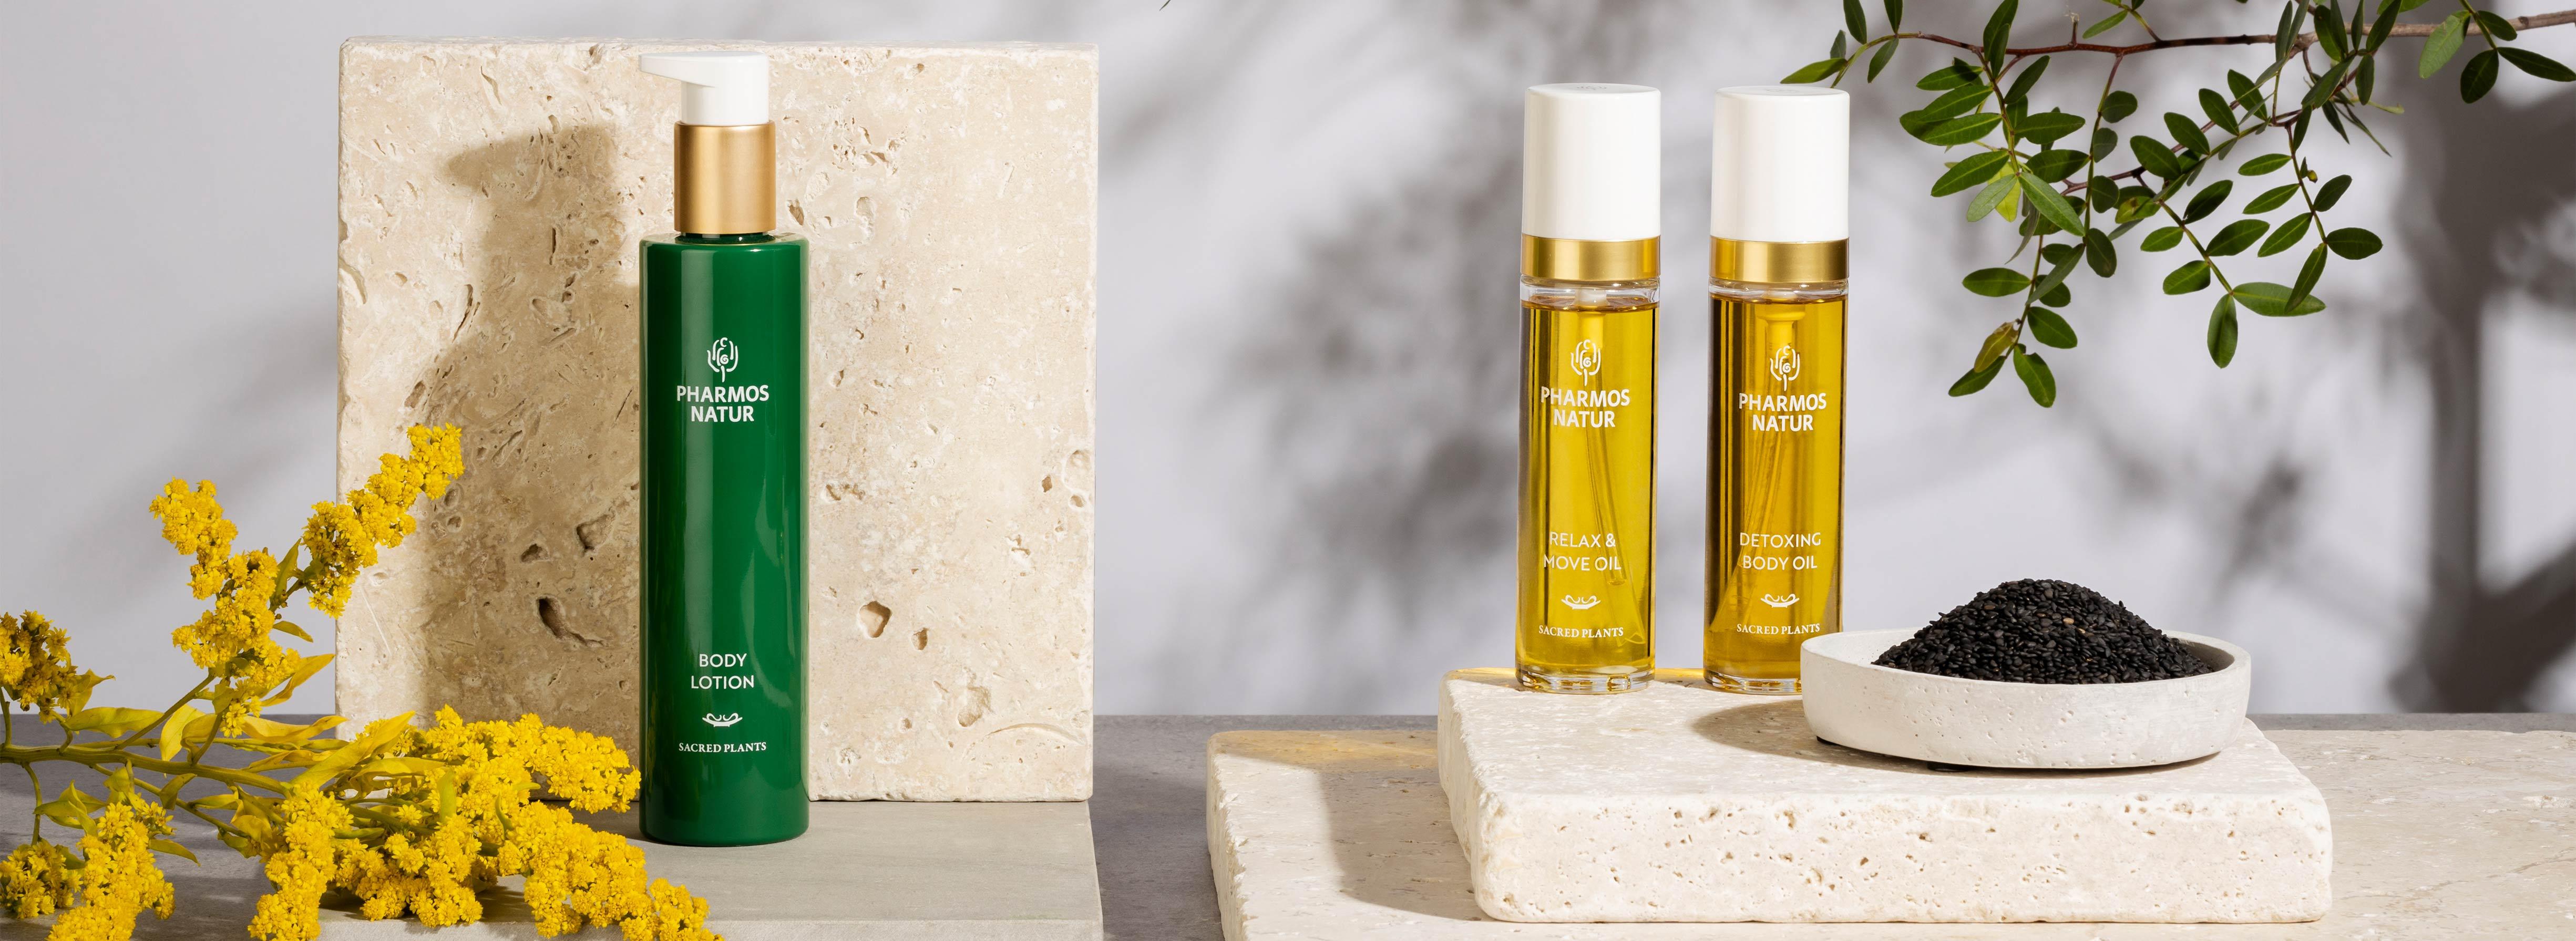 Produktlinie Body Care mit Body Lotion, Relax & Move, Detoxing Body Oil